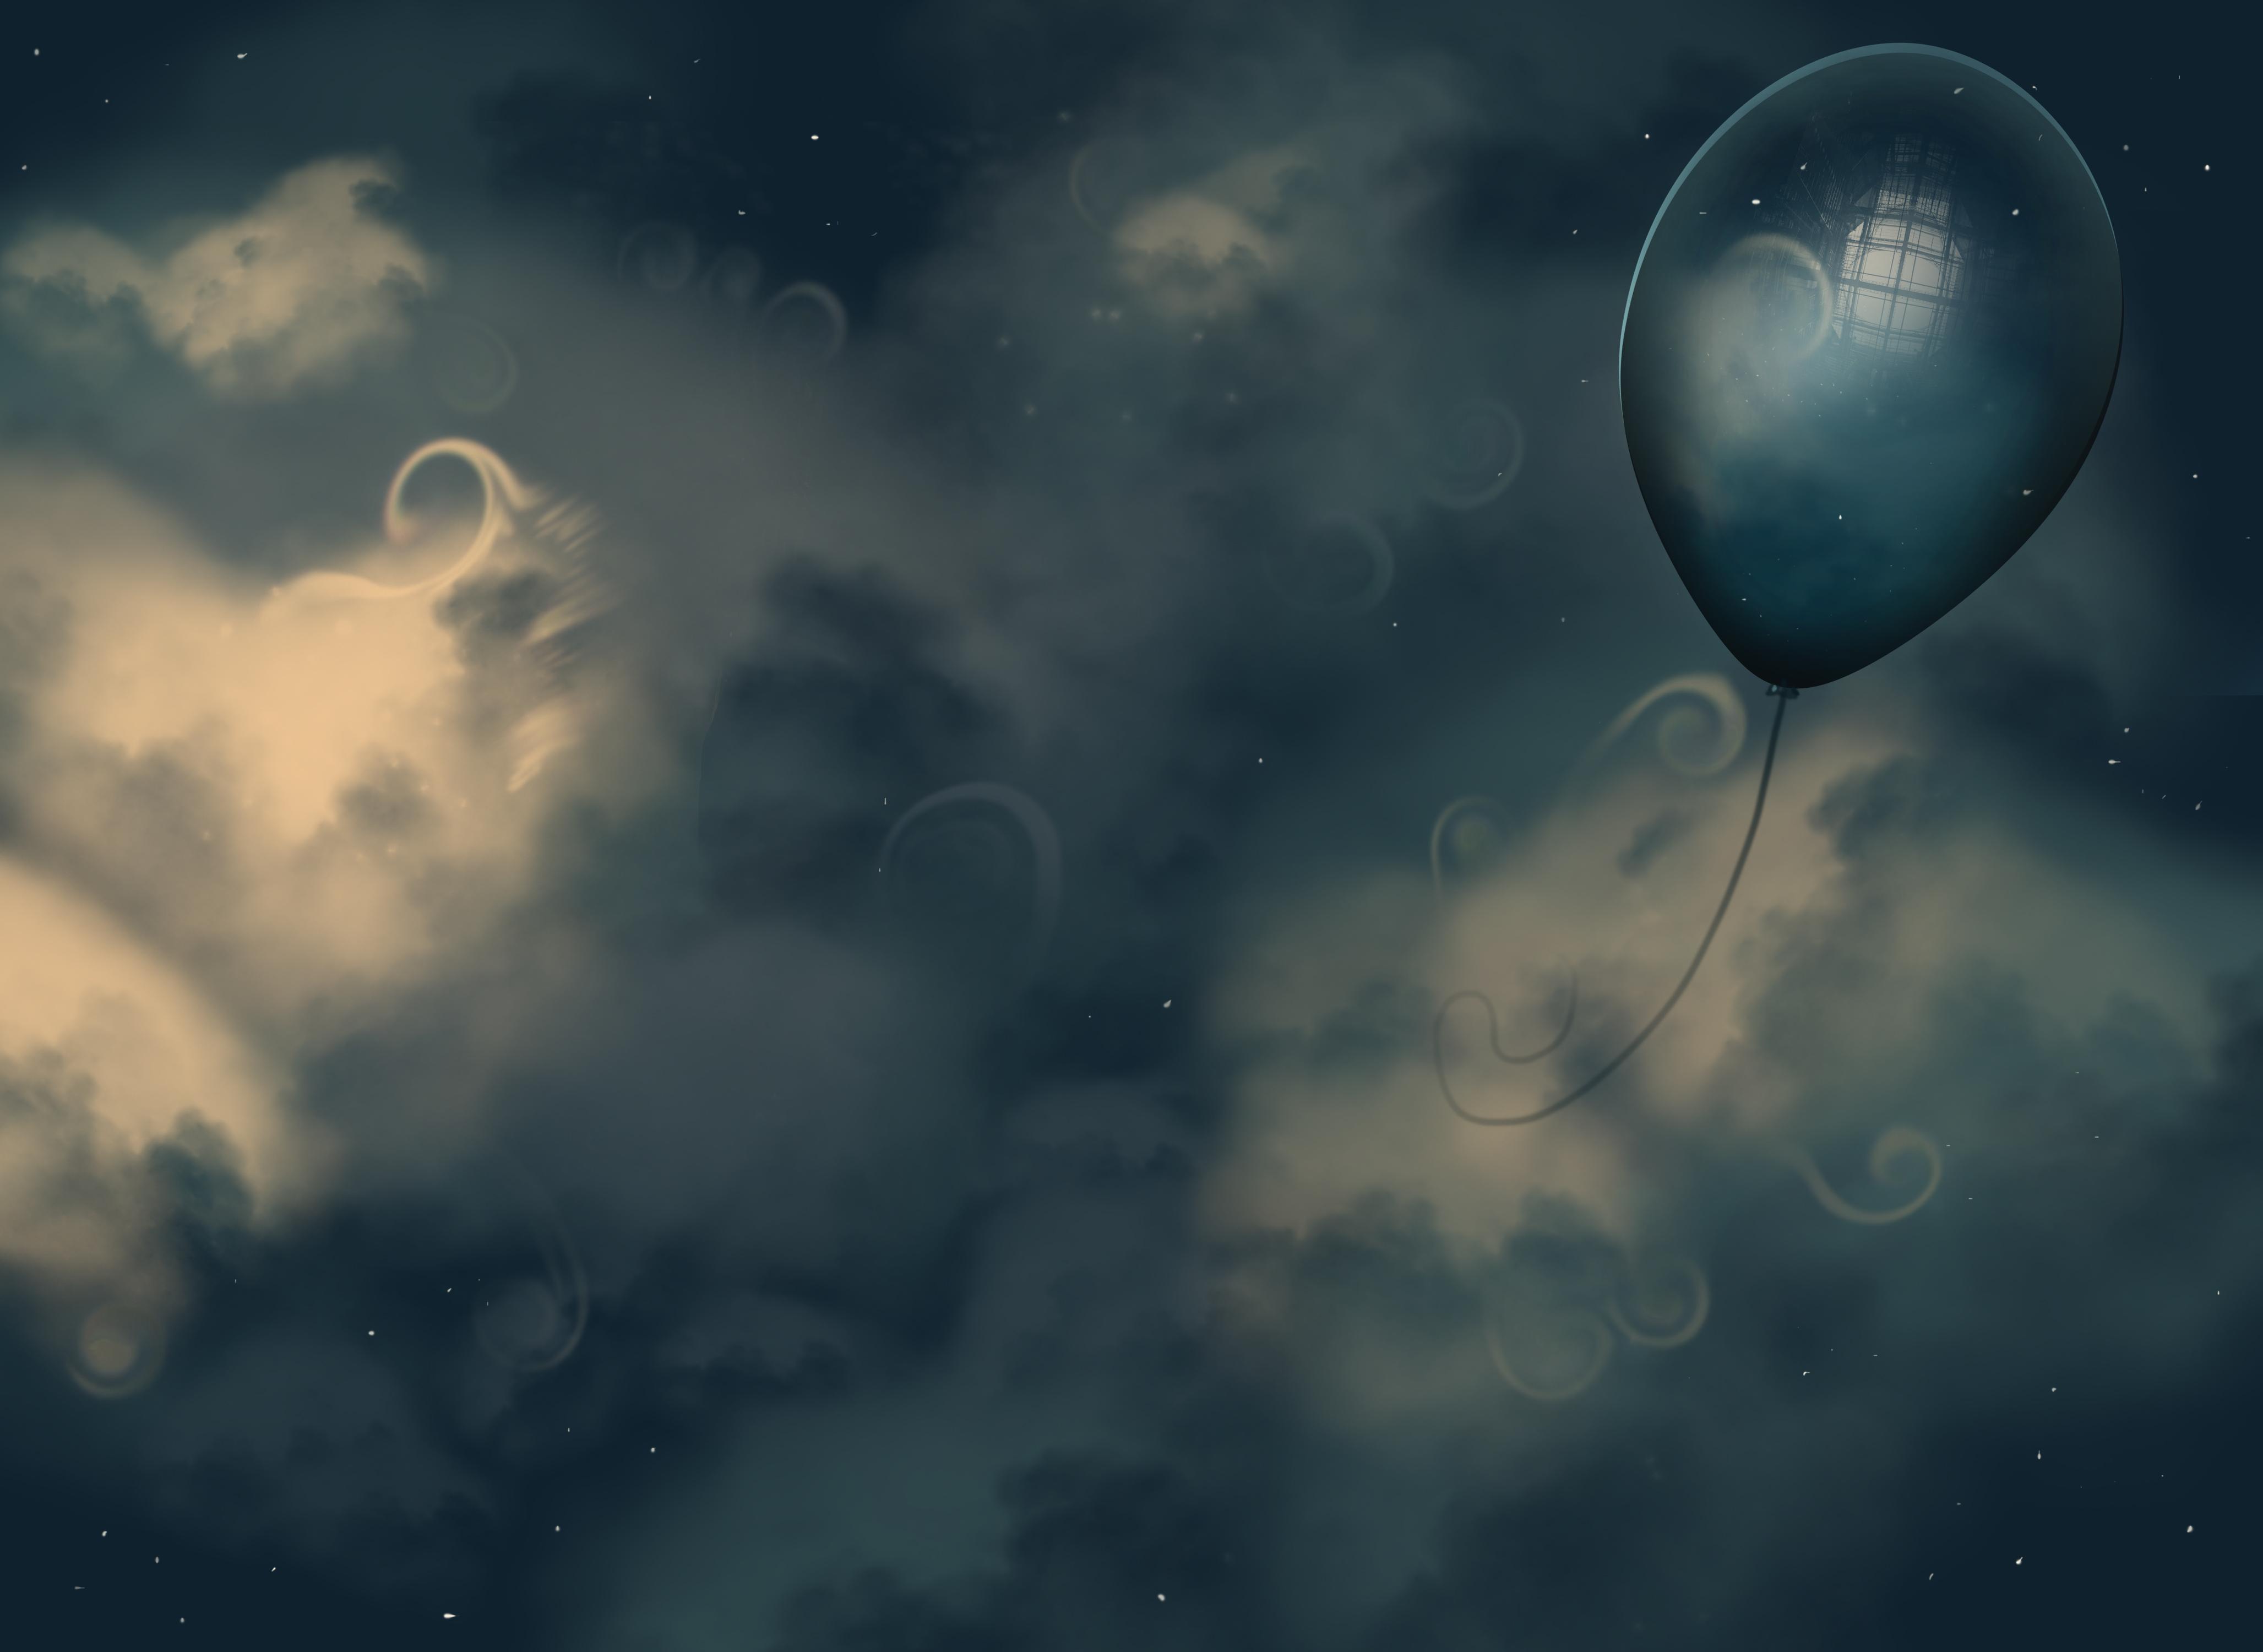 Balloon Sky by JessHavok